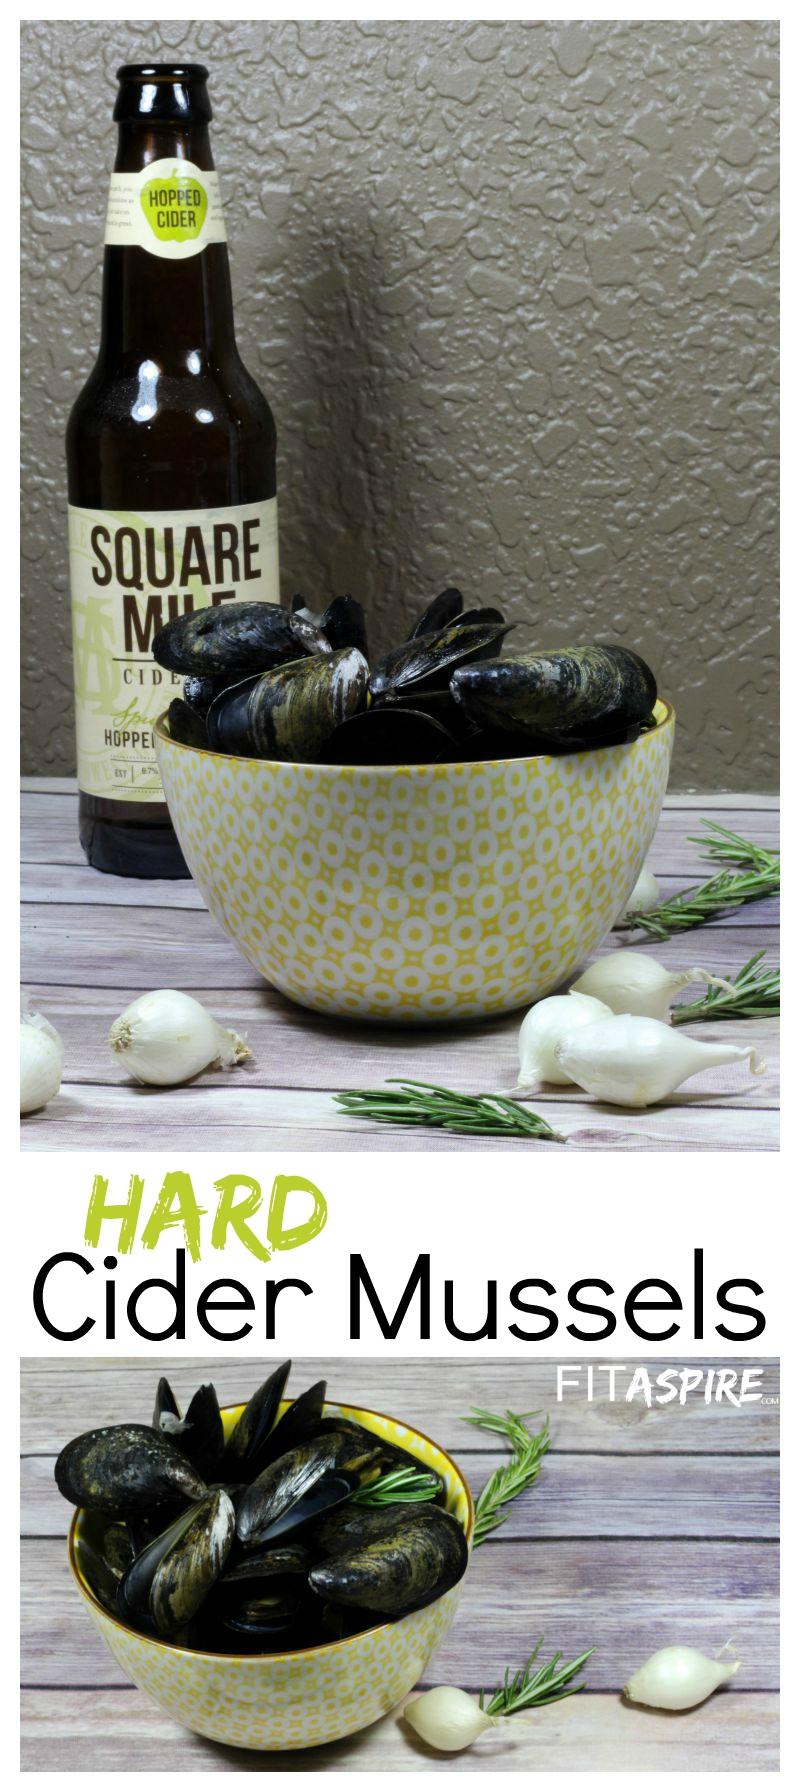 Hard Cider Mussels